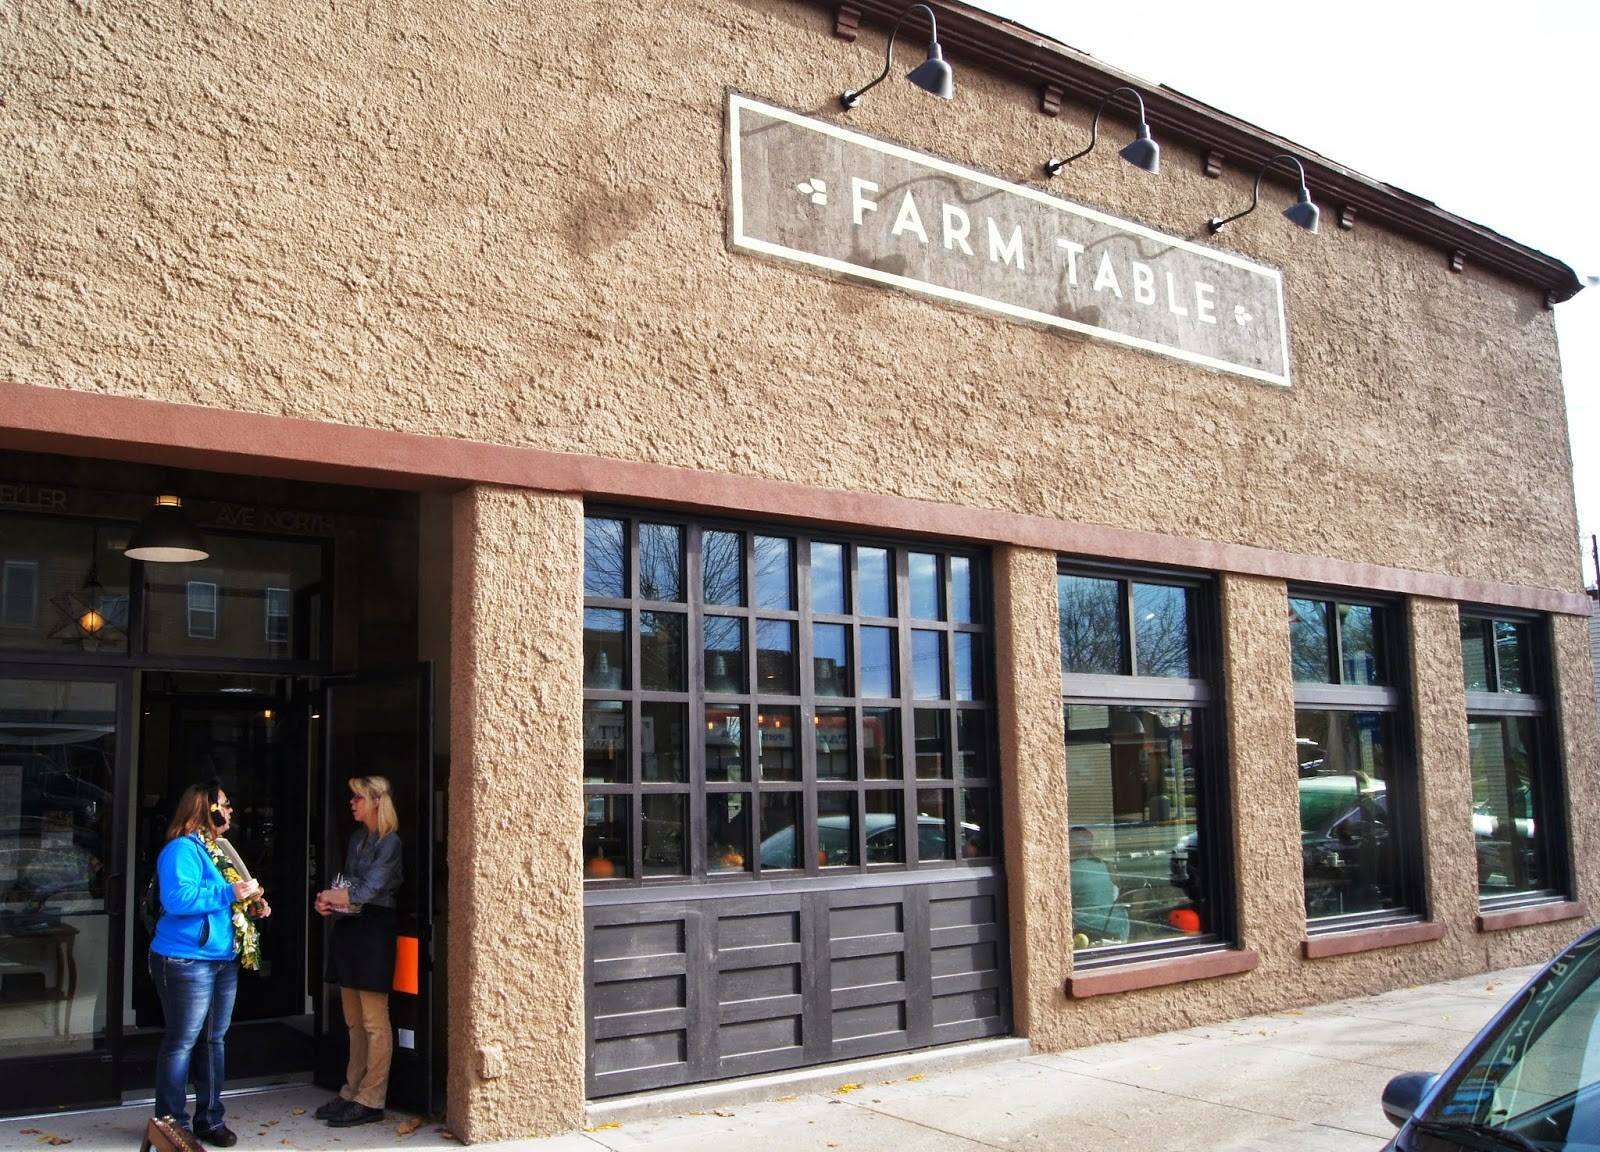 Farm Table Restaurant In Rural Amery Is Wisconsins Best Hidden Gem - Farm table restaurant amery